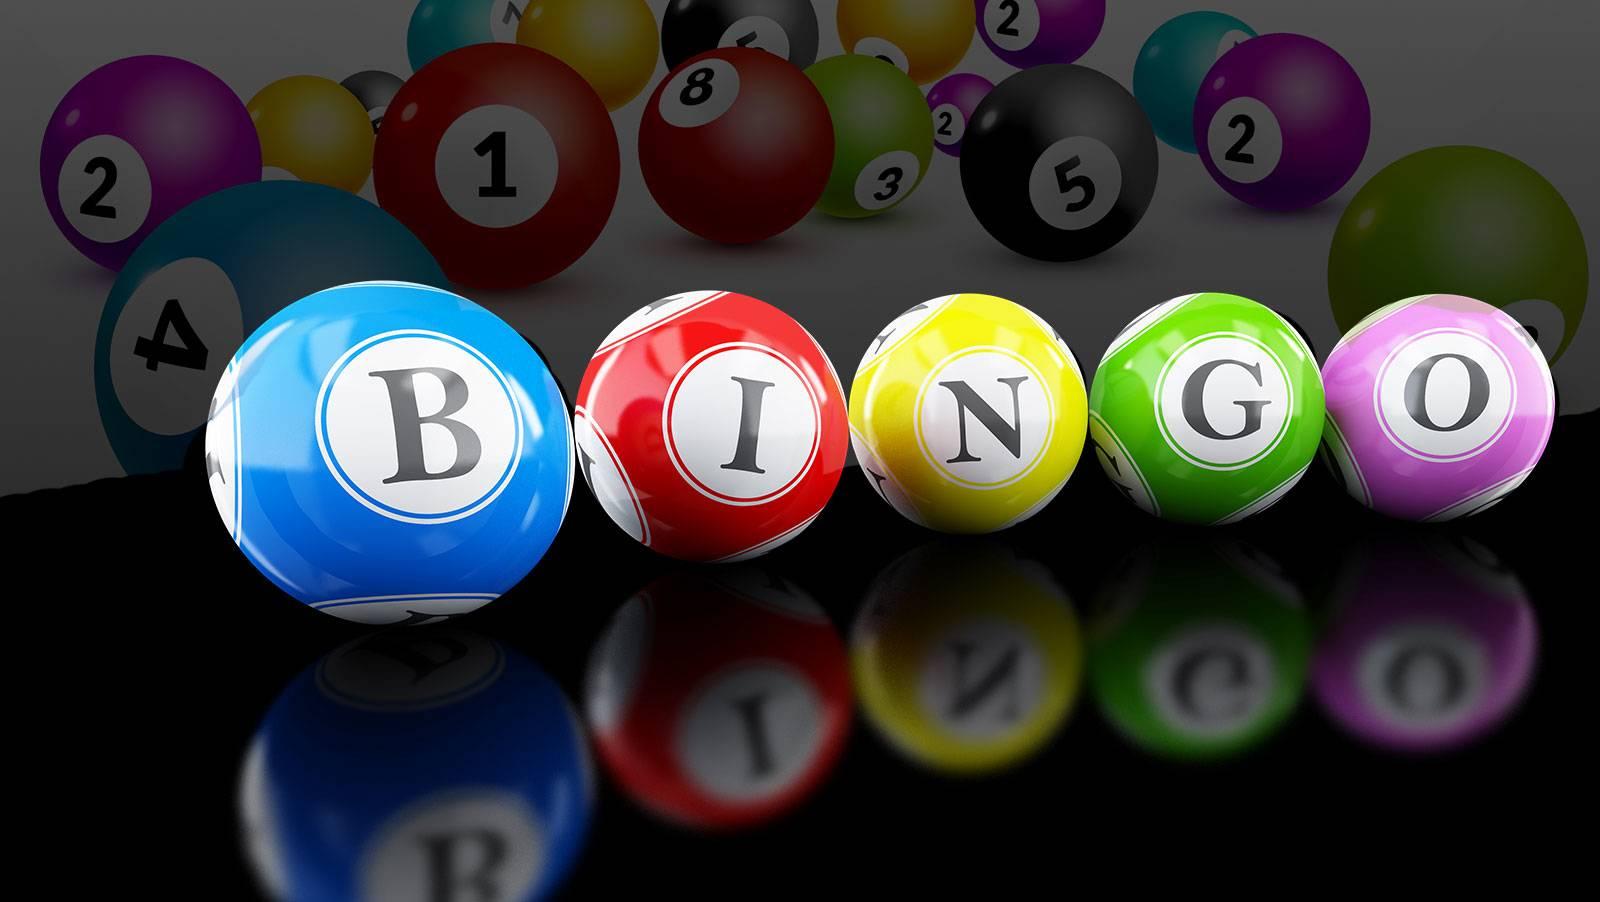 The Bingo Project